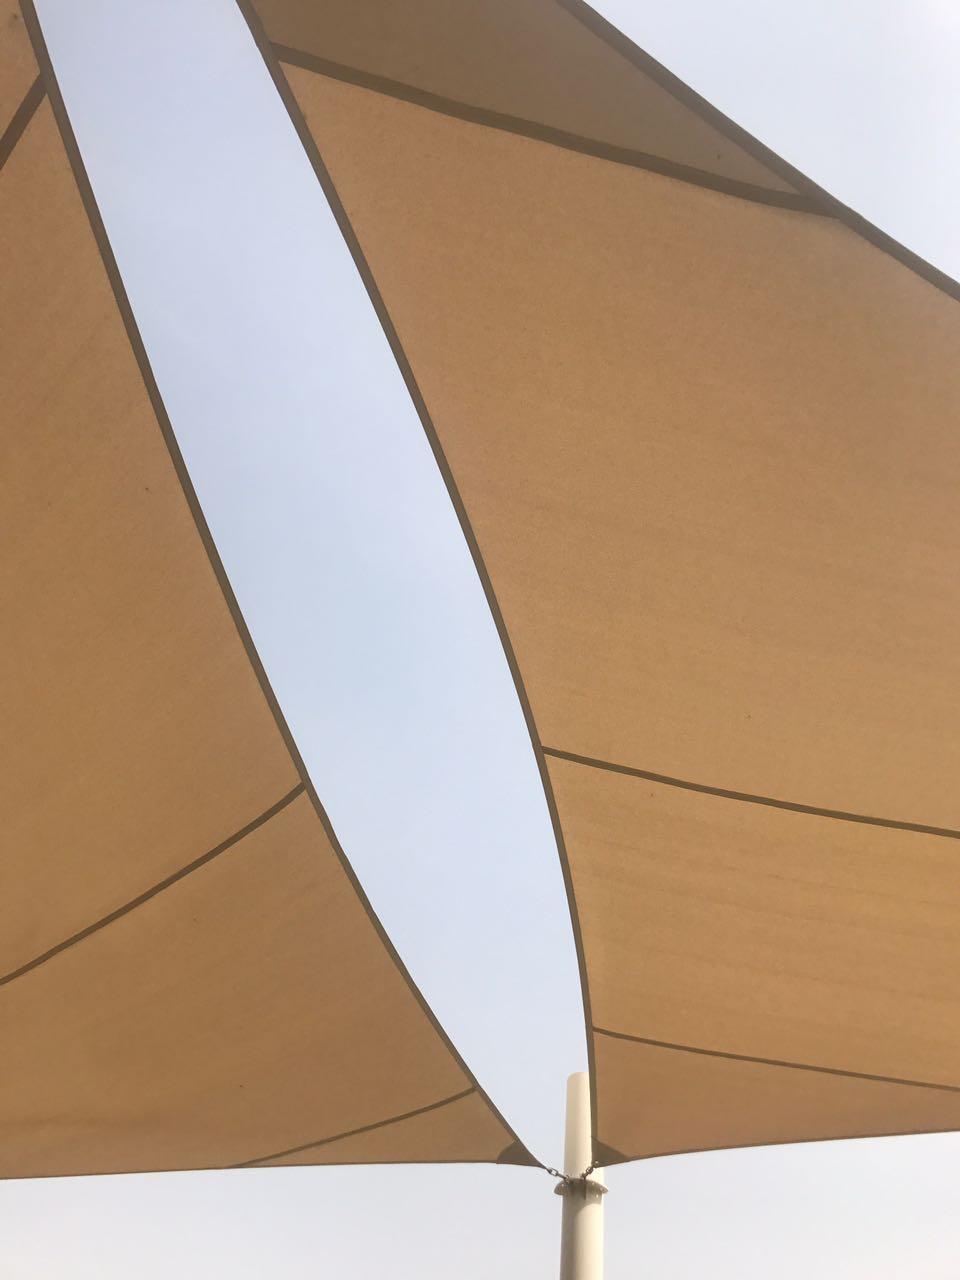 triangle sail shades installation in abu dhabi